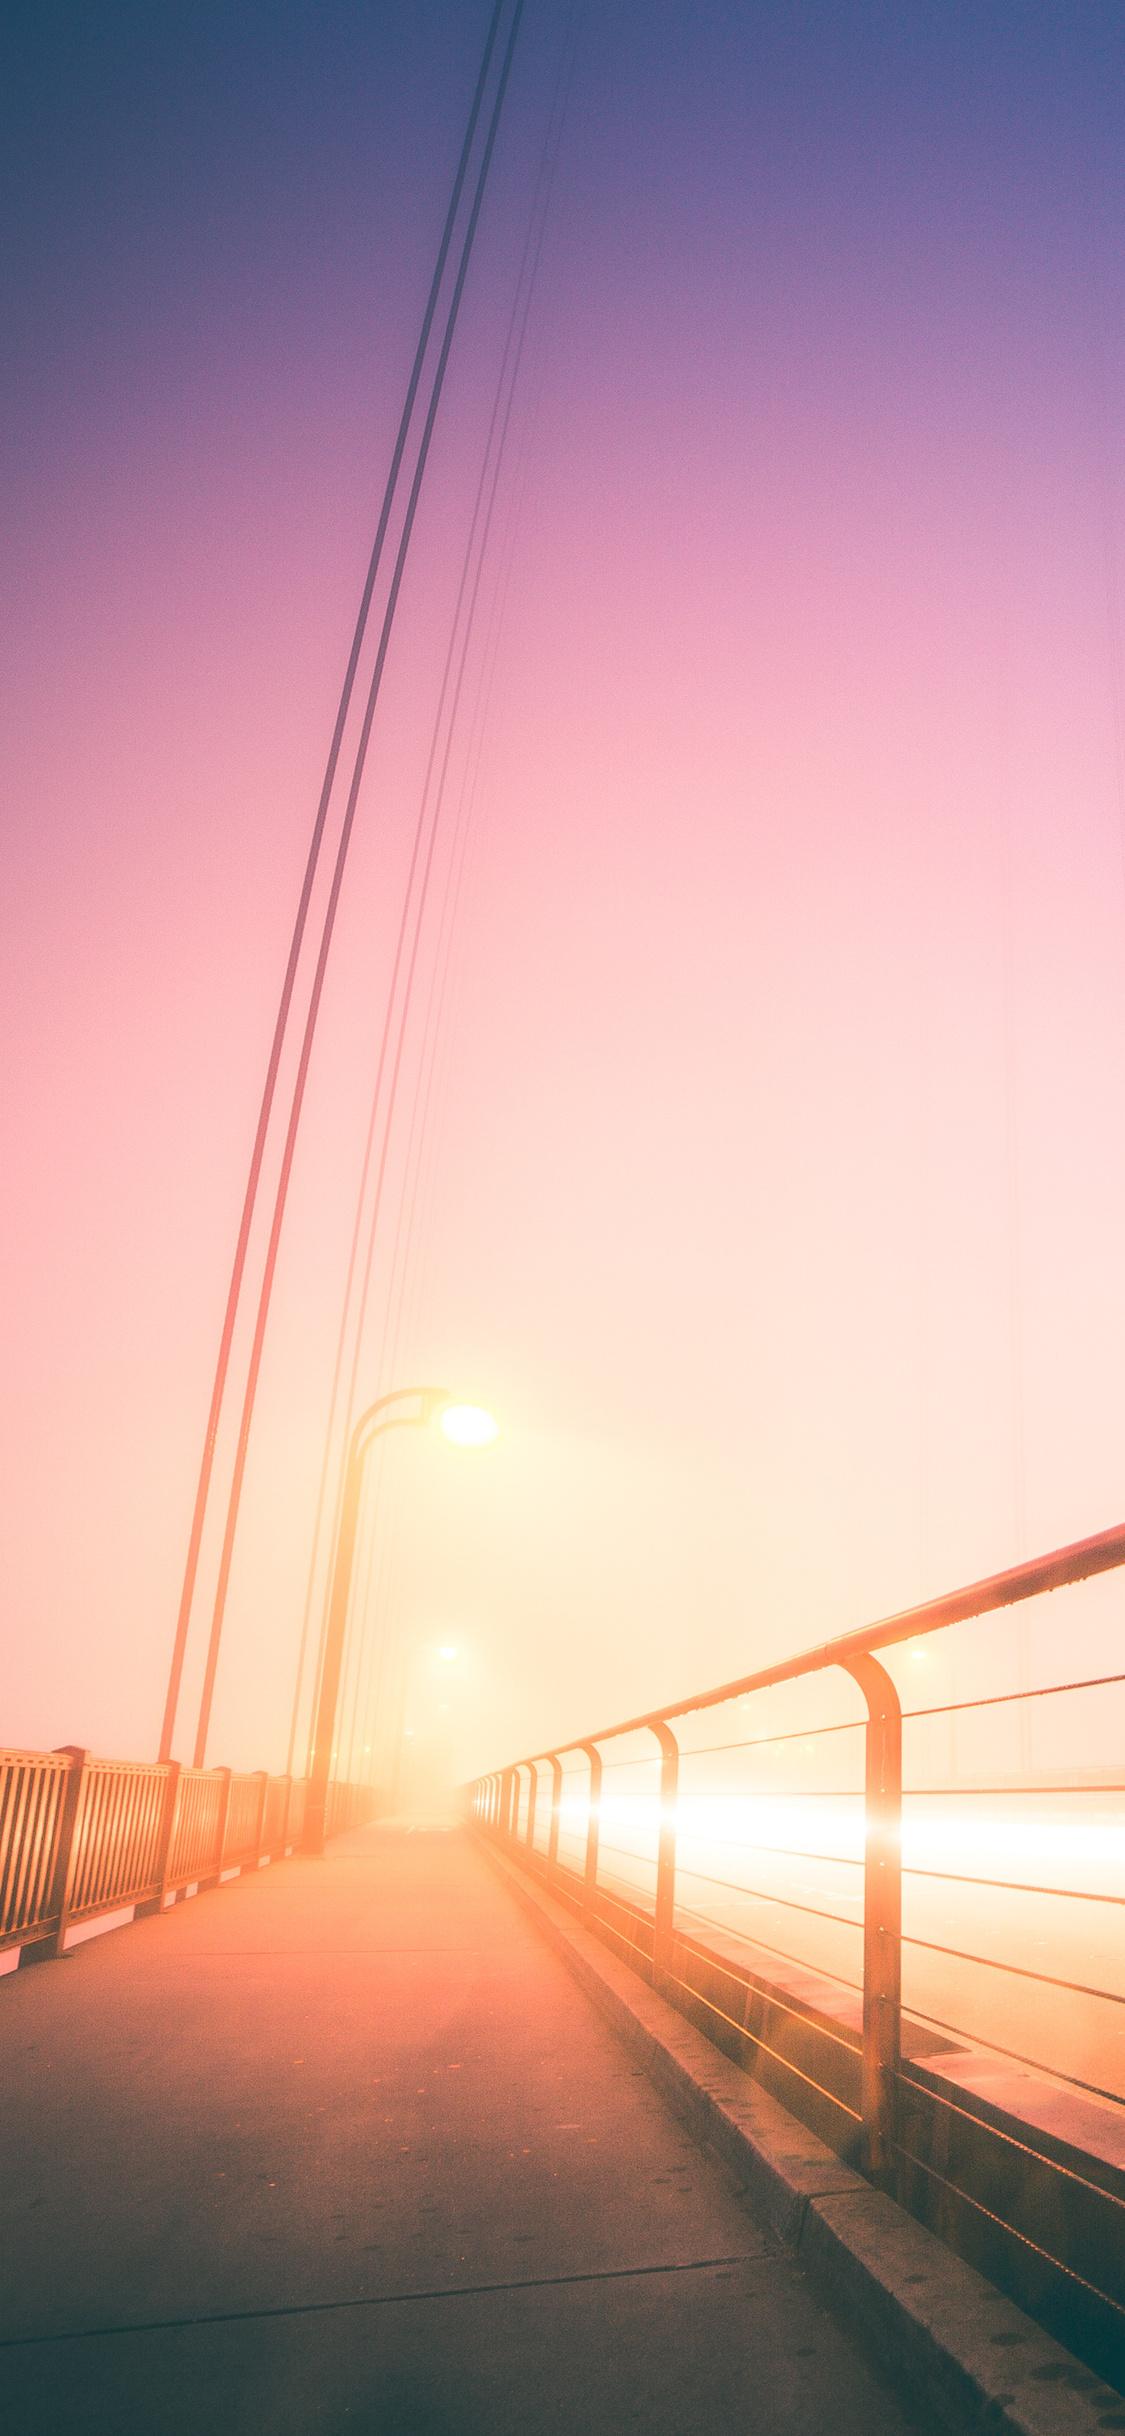 1125x2436 Golden Gate Bridge Ultra Hd 4k Iphone Xs Iphone 10